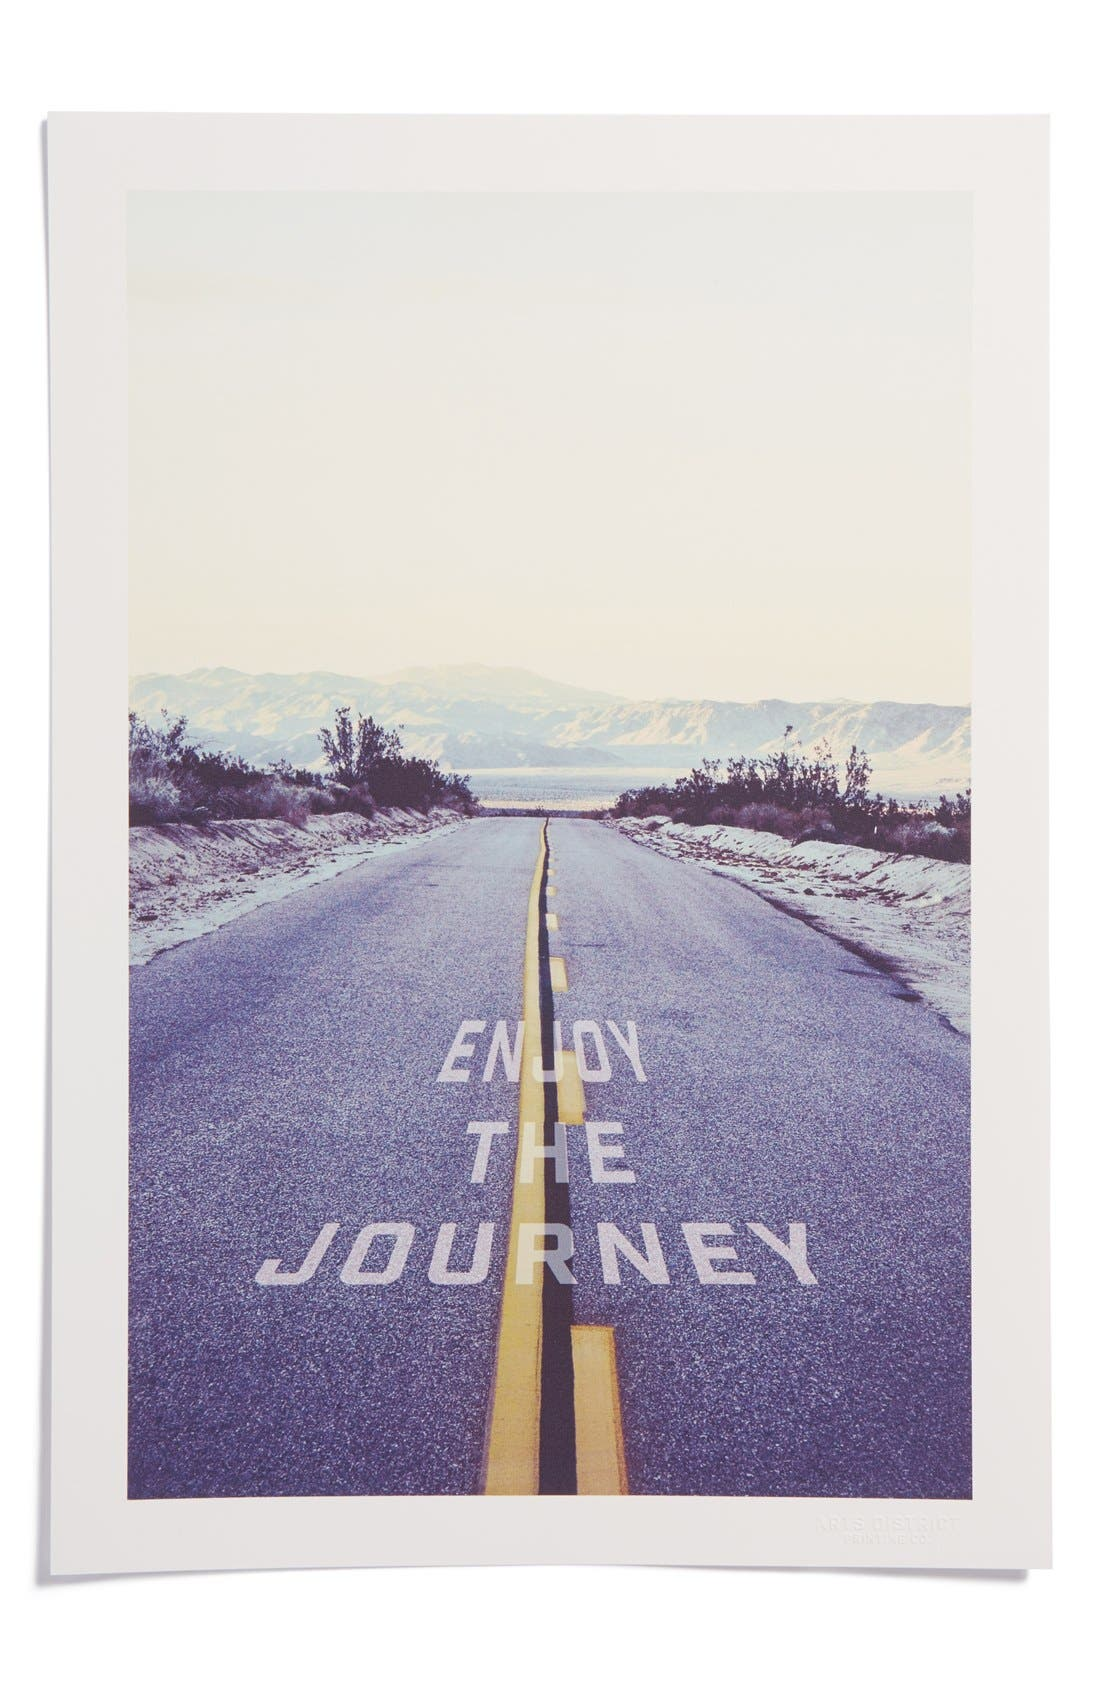 Main Image - Arts District Printing Co. 'Enjoy the Journey' Print